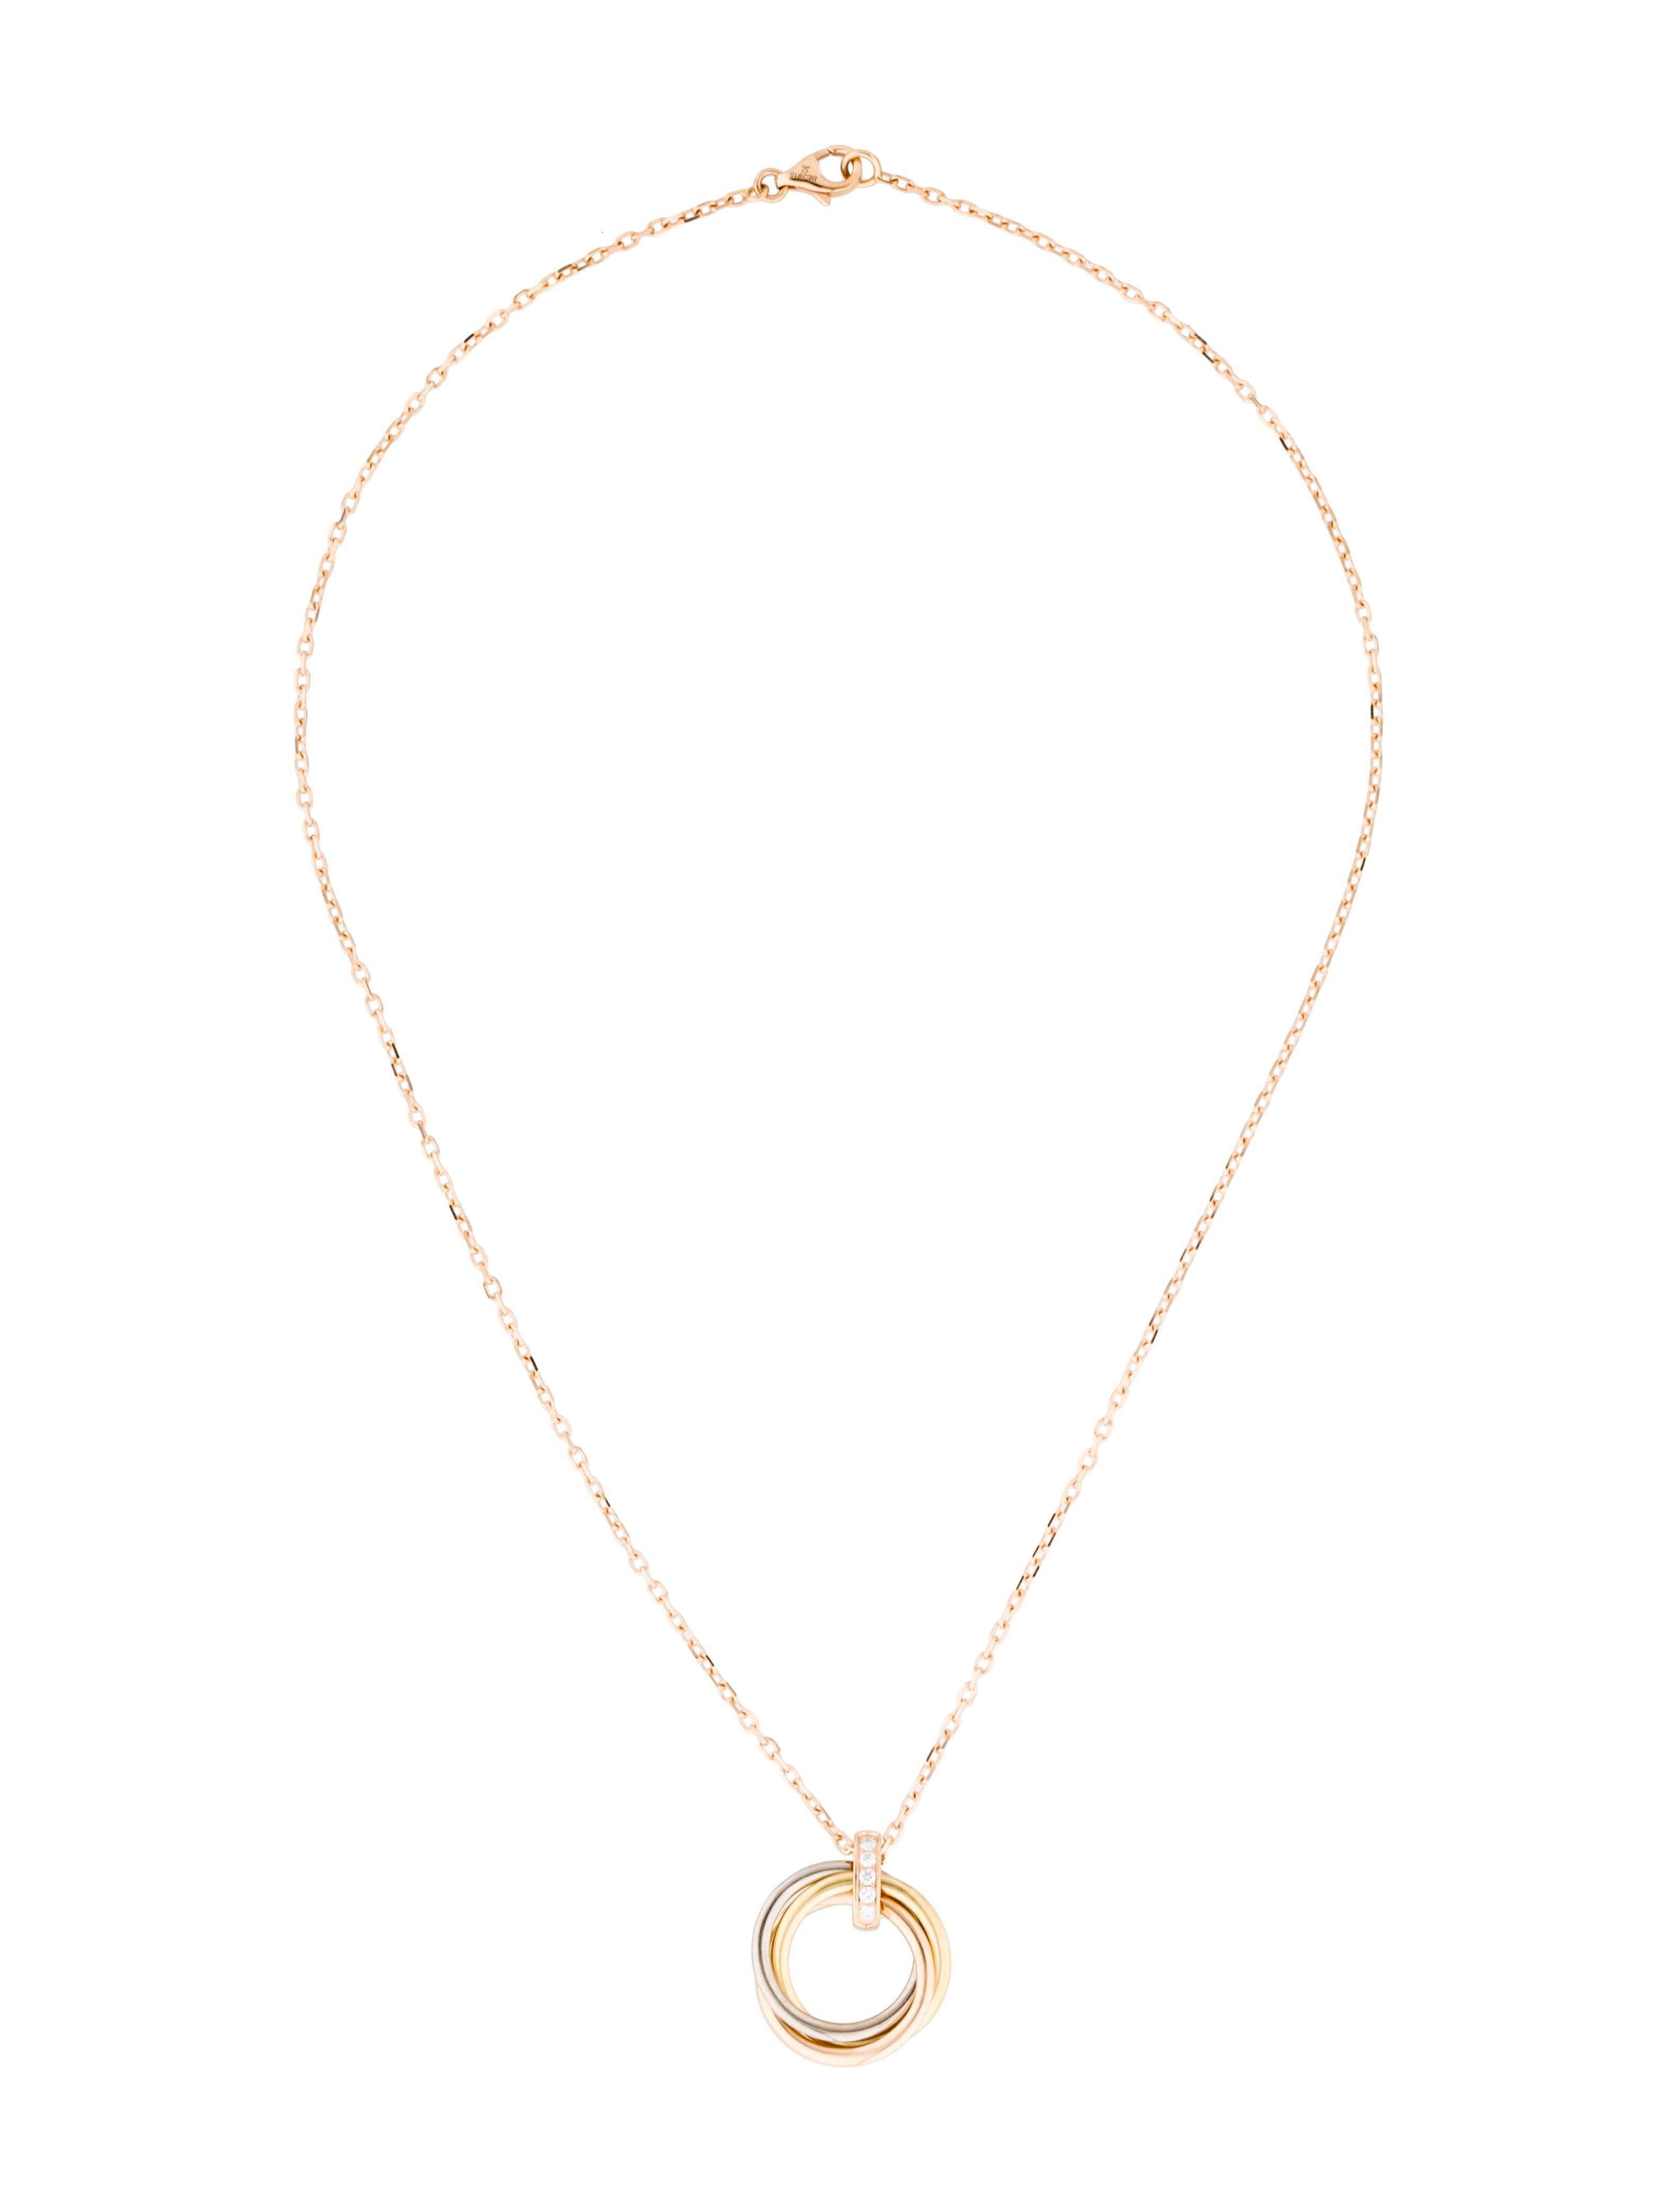 Cartier trinity de cartier diamond pendant necklace necklaces trinity de cartier diamond pendant necklace aloadofball Images